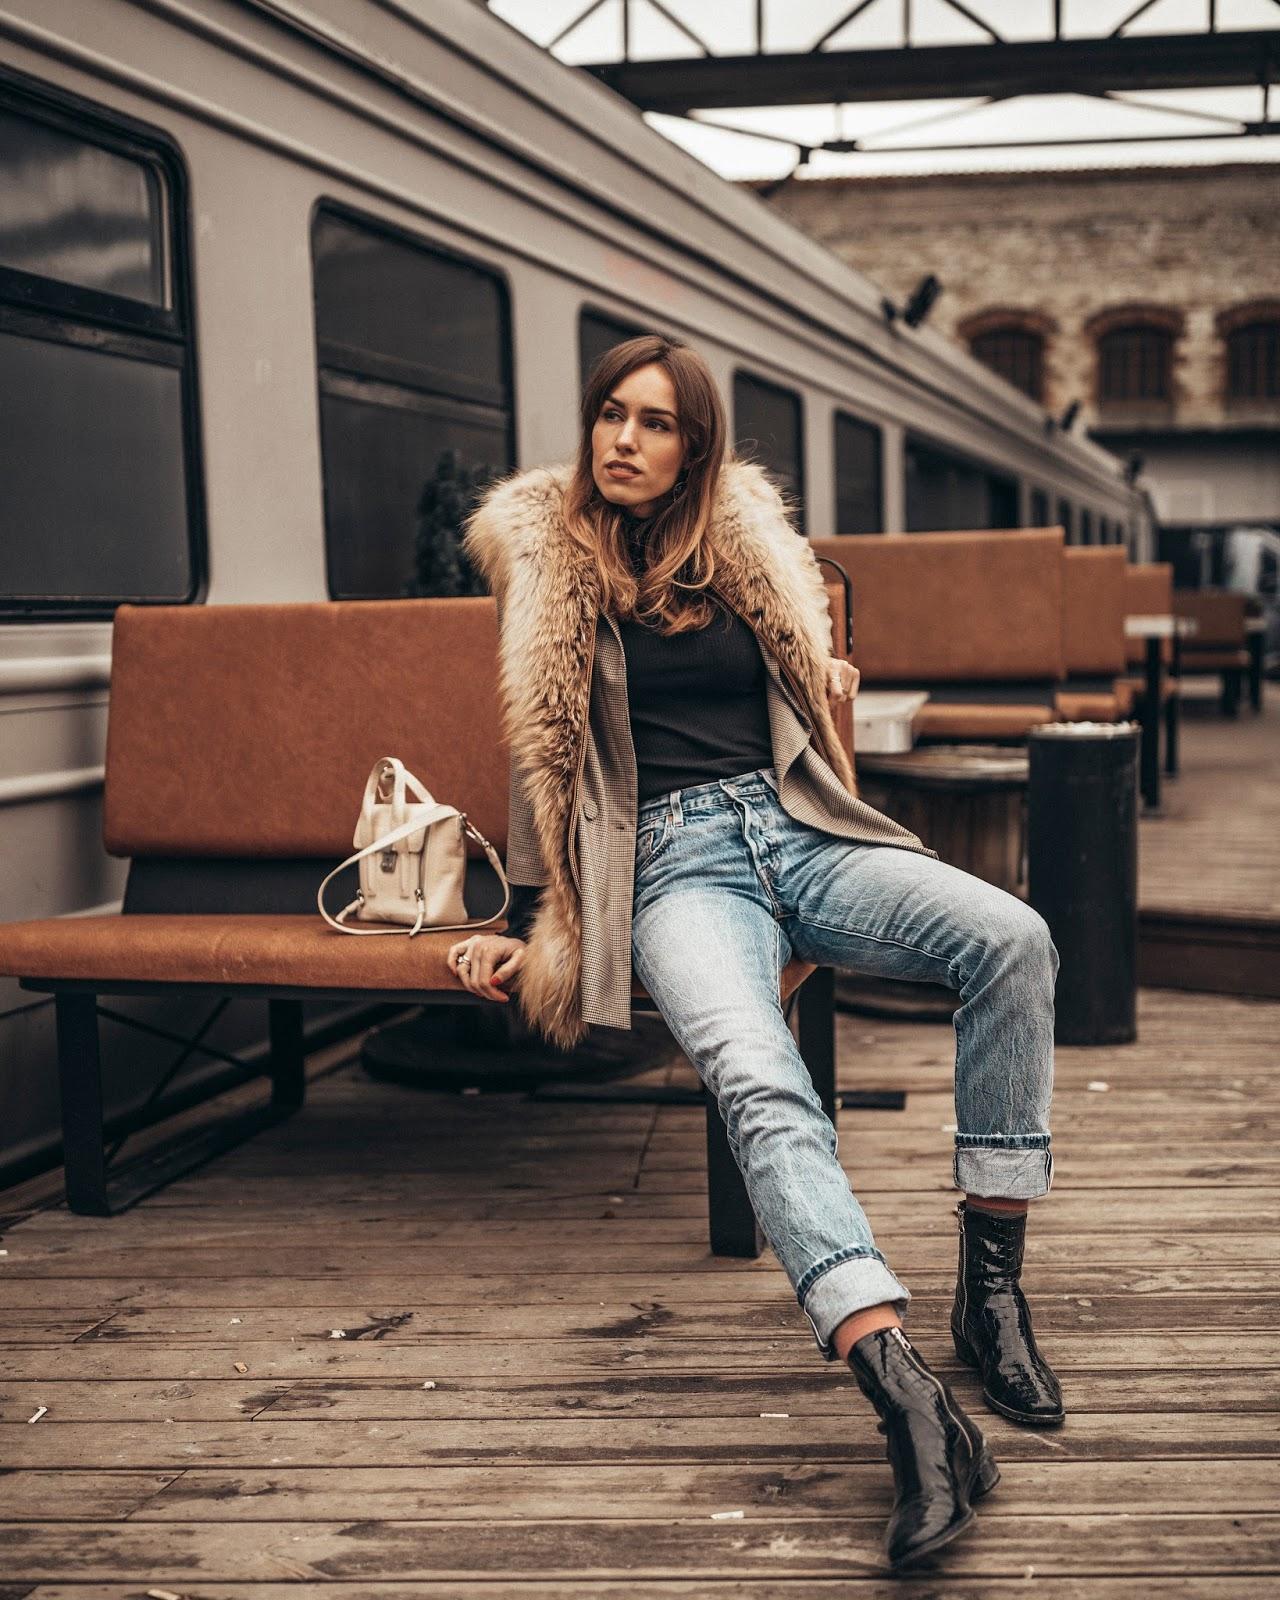 fur vest over blazer outfit minimalist